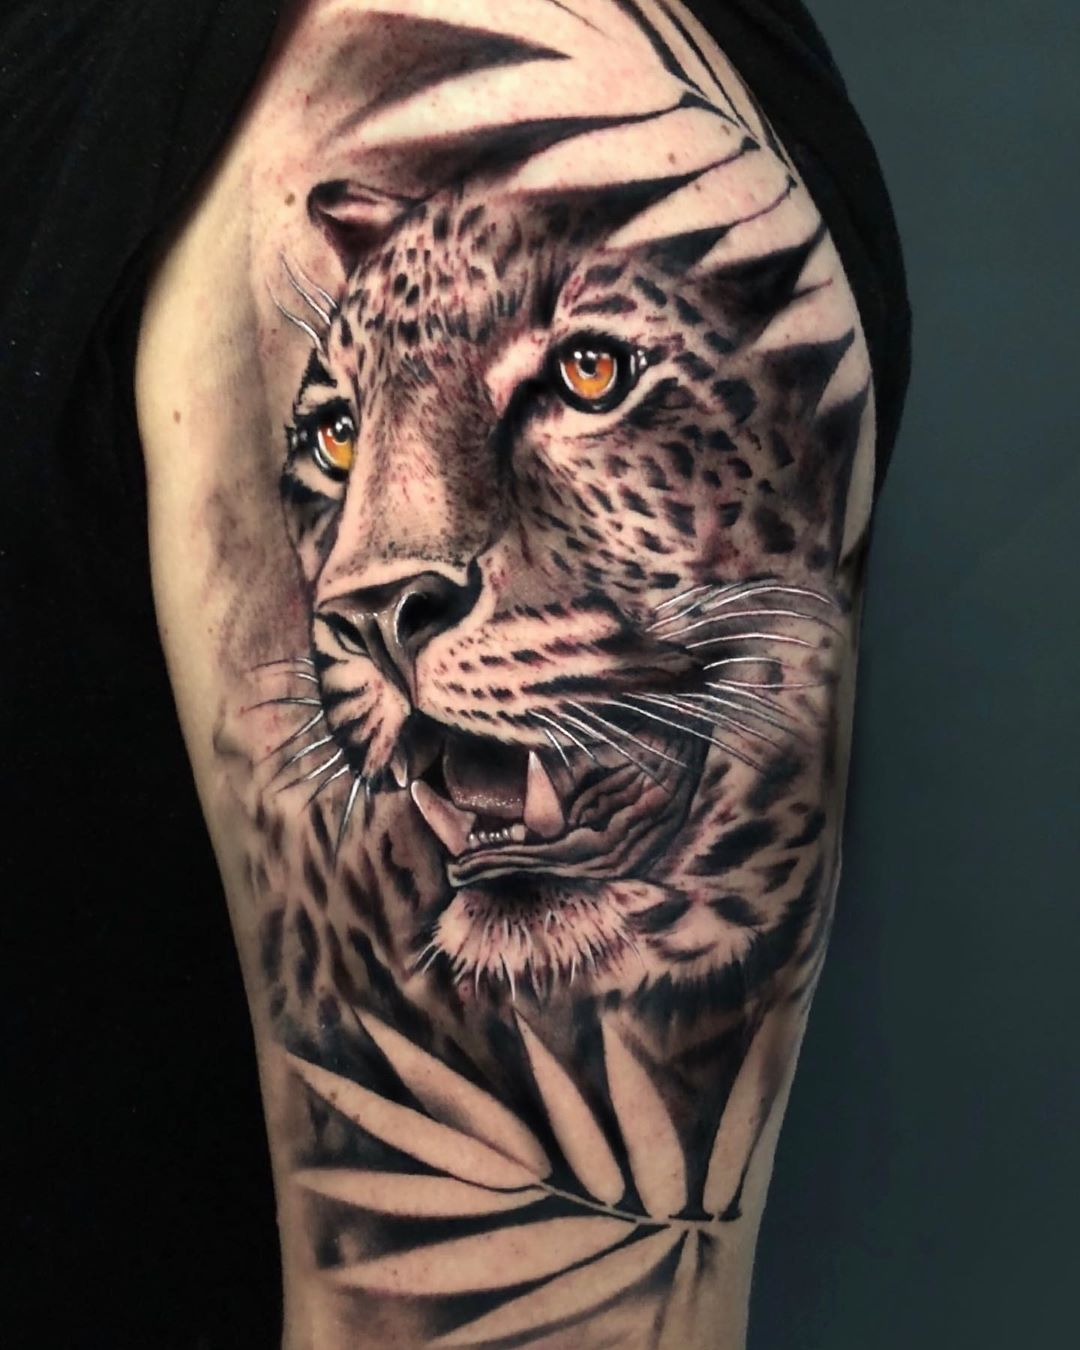 followforfollow,berlin,followmeciudadreal,ciudadreal,tomelloso,almagro,puertollano,tatuajesenpuertollano,tatuajesendaimiel,ciudadrealtattoo,ciudadrealtatuajes,tatuajesciudadreal,follow,ciudadrealtatuajes,puertollano,tattooers,besttattooers,juantabasco,ciudadrealsetatua,ink,tatuajes,realiismo,realistictattoo,ciudadrealtattoo,tatuajesenpuertollano,traditionaltattoos,castillalamancha